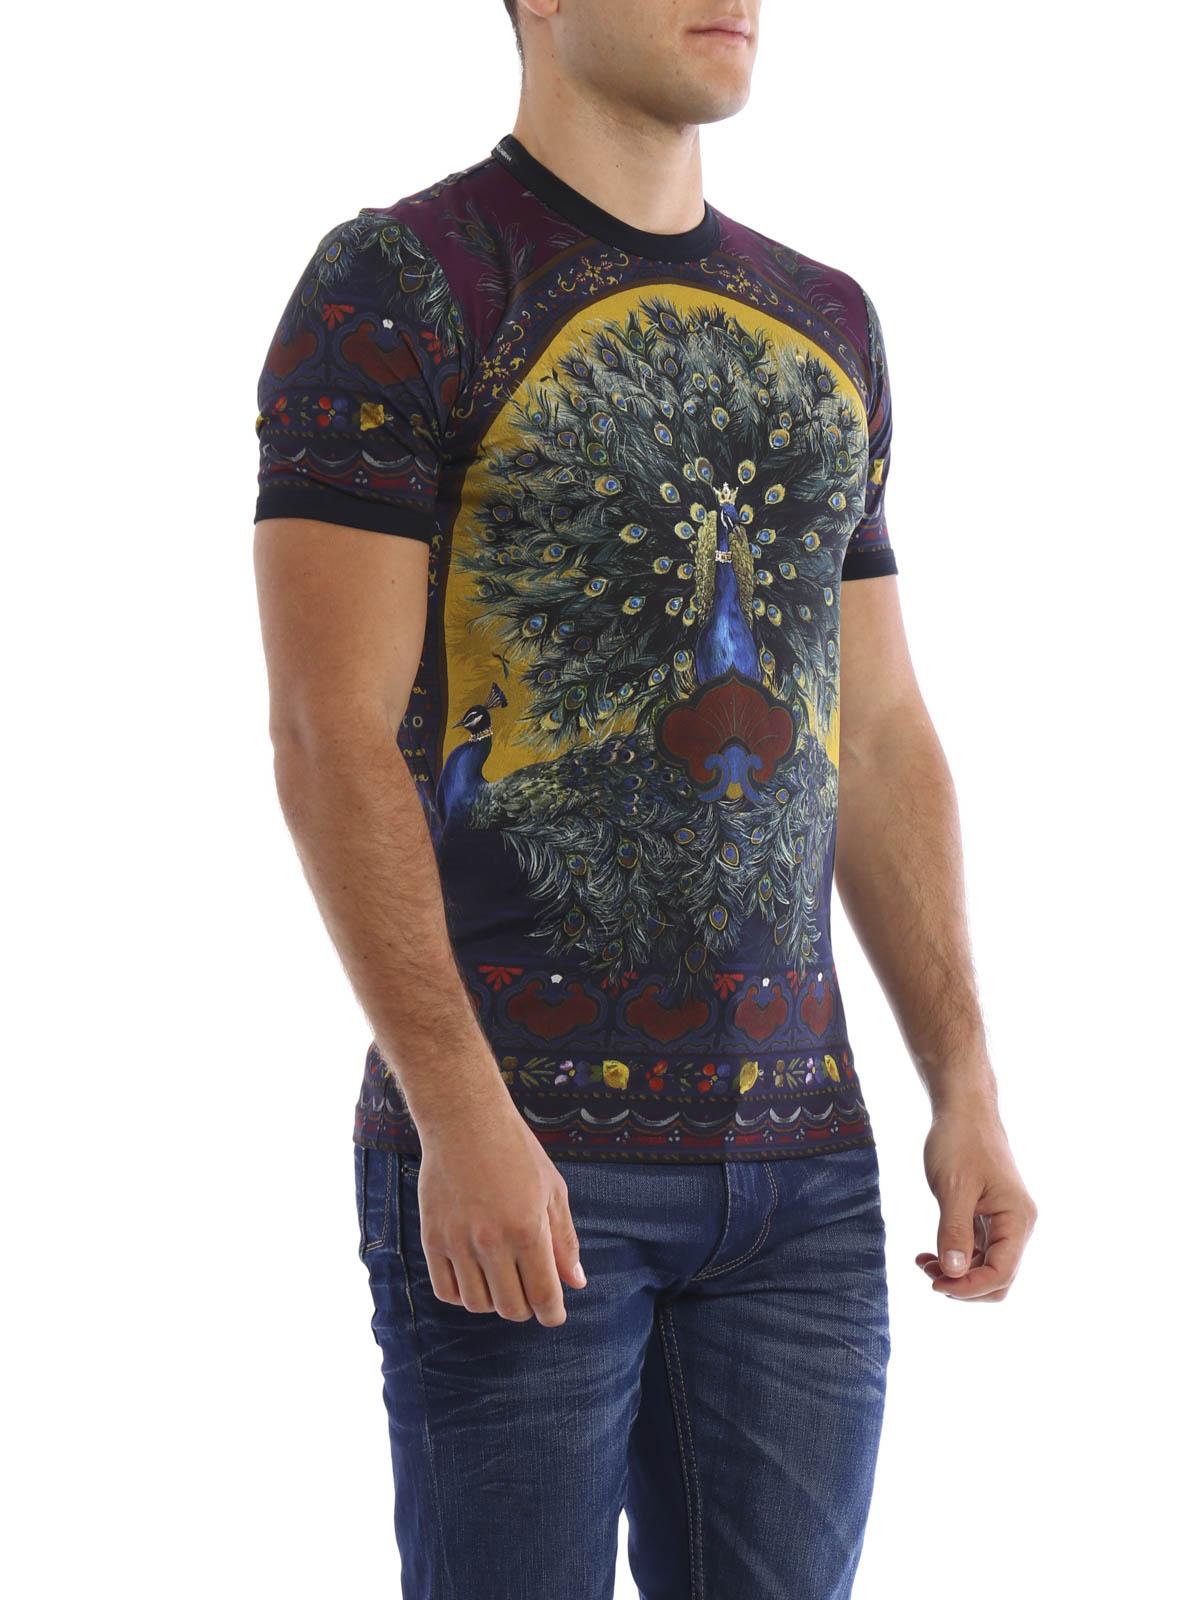 dolce gabbana peacock print t shirt t shirts g8fv4t fp7iox0860